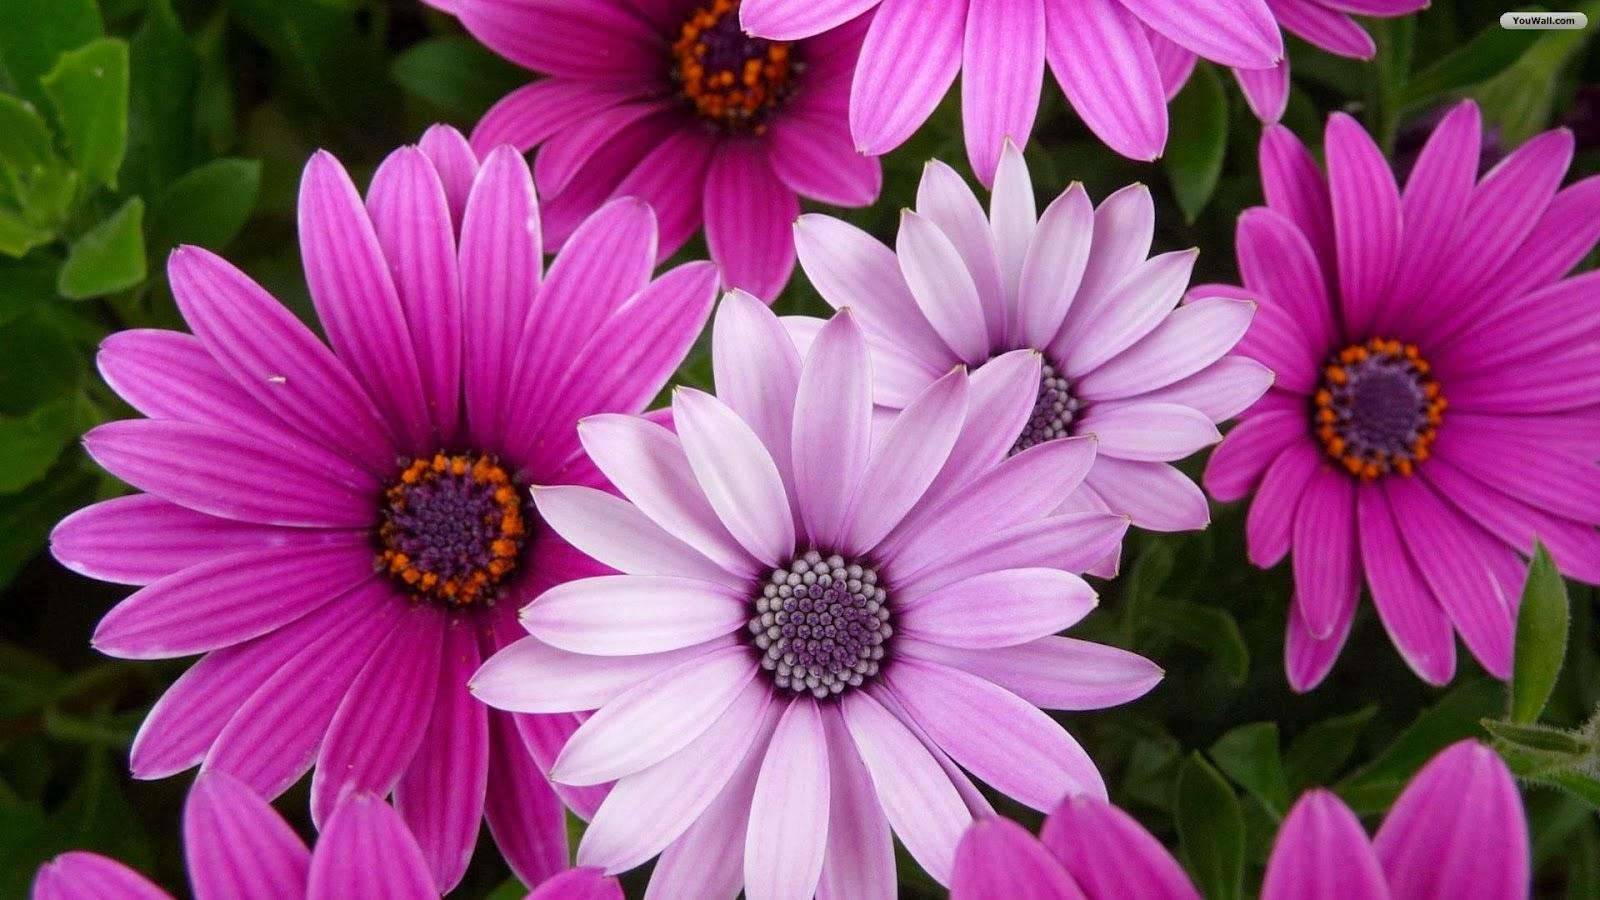 Beautiful Purple White Flowers Hd Wallpapers